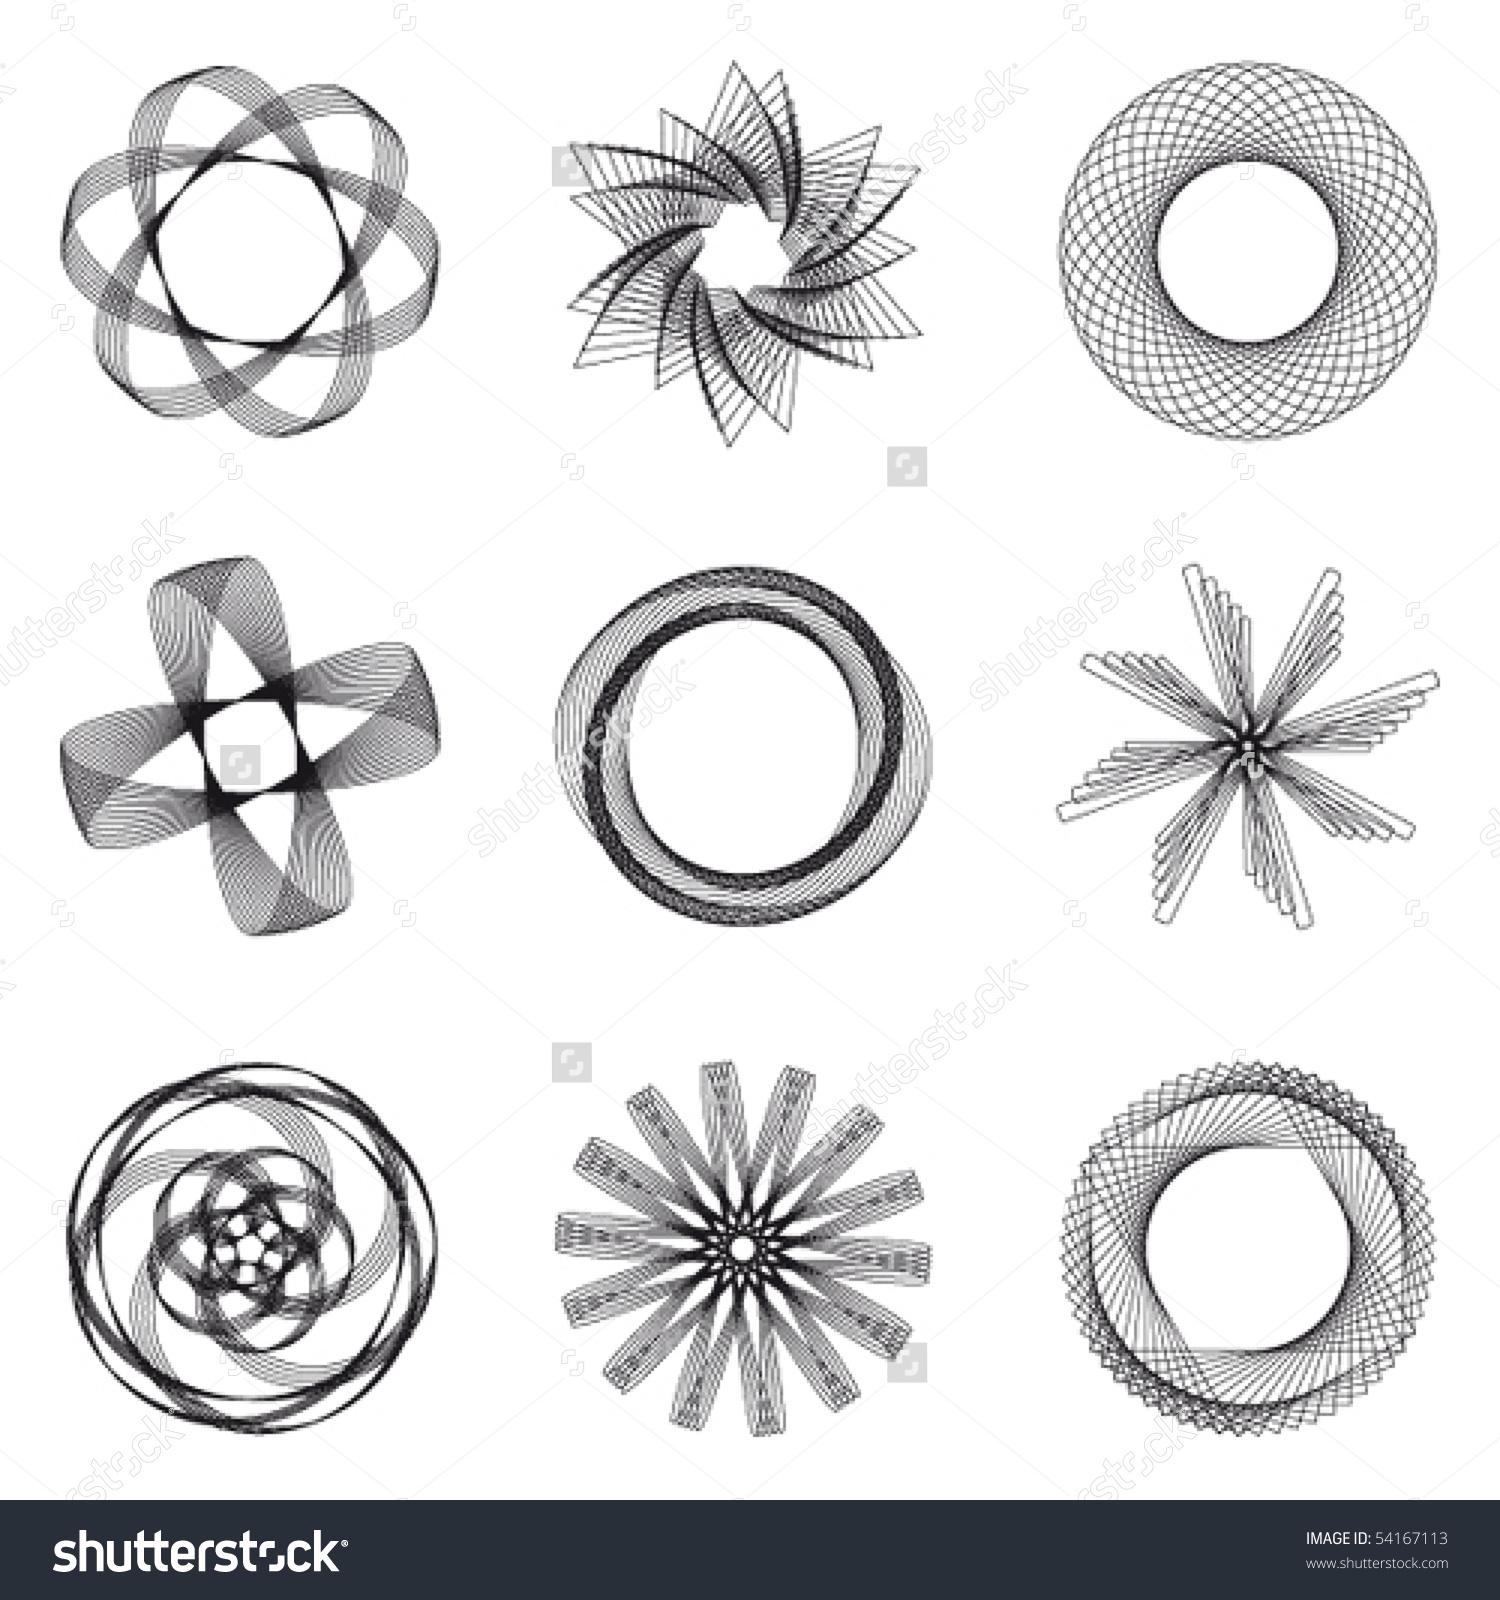 Set Spirograph Design 9 Elements Vector Stock Vector 54167113.